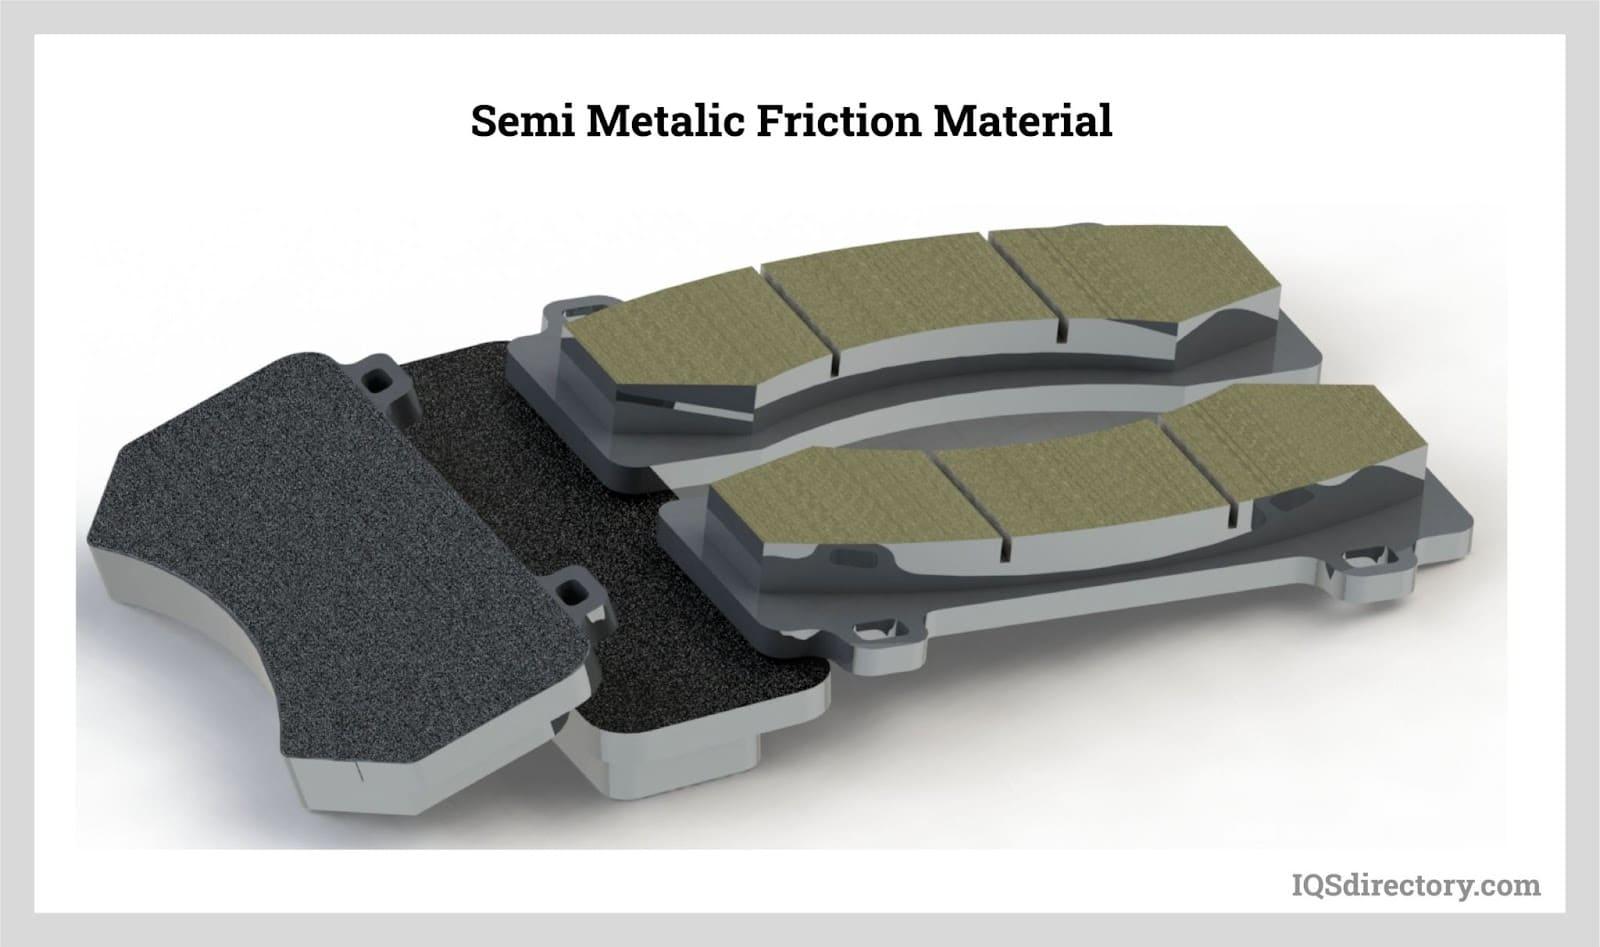 Semi-Metallic Friction Material